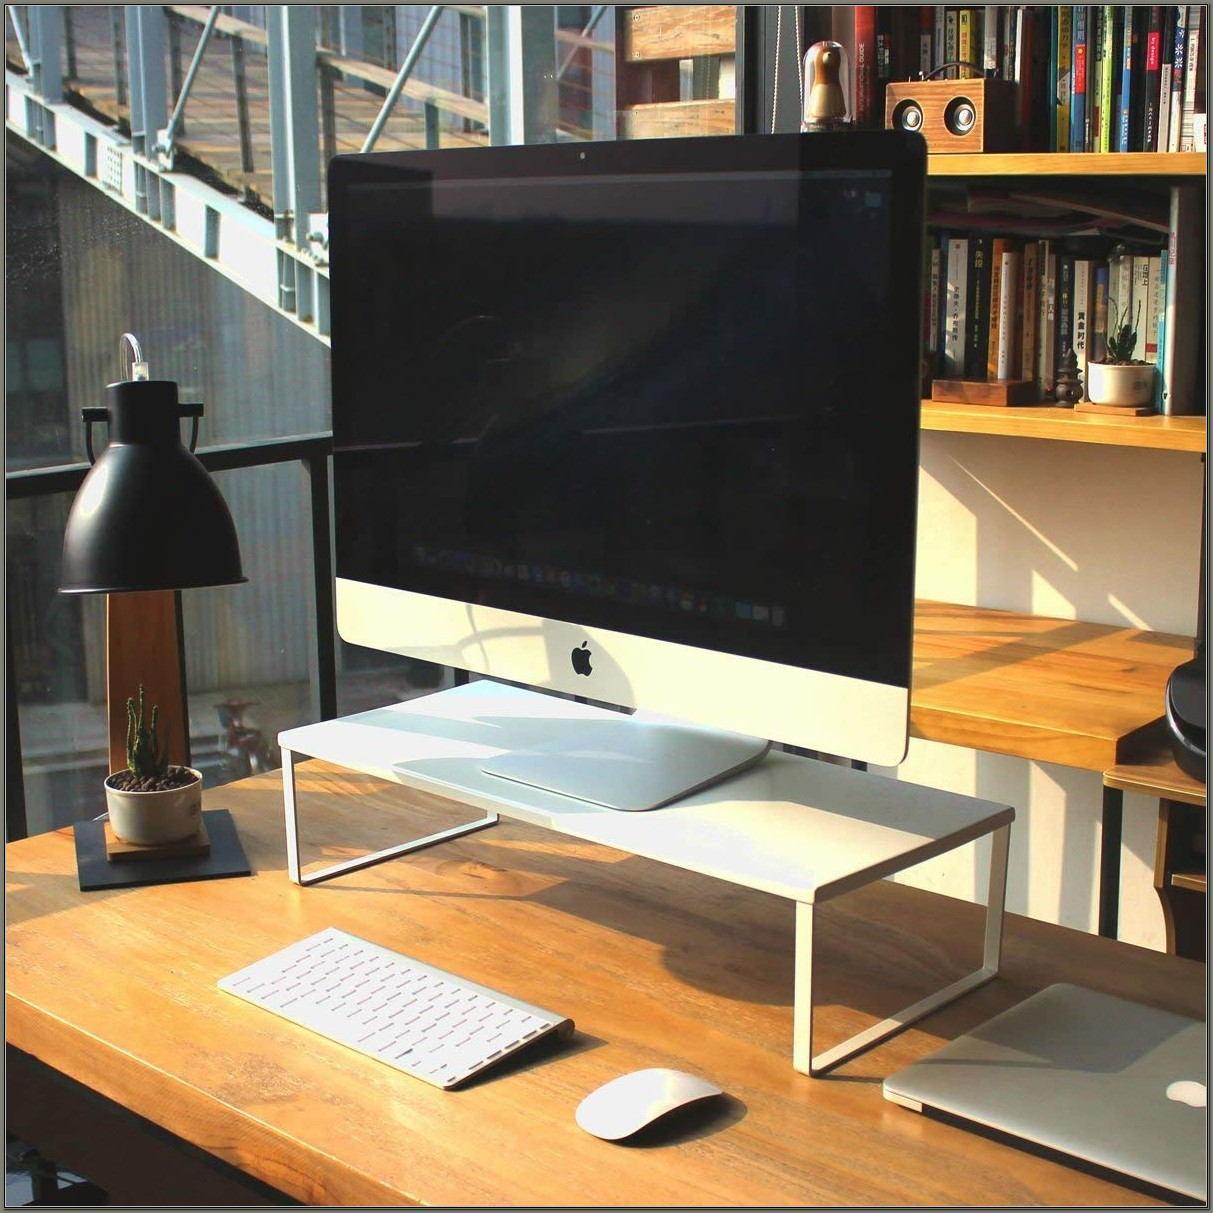 Computer Monitor Shelf For Desk